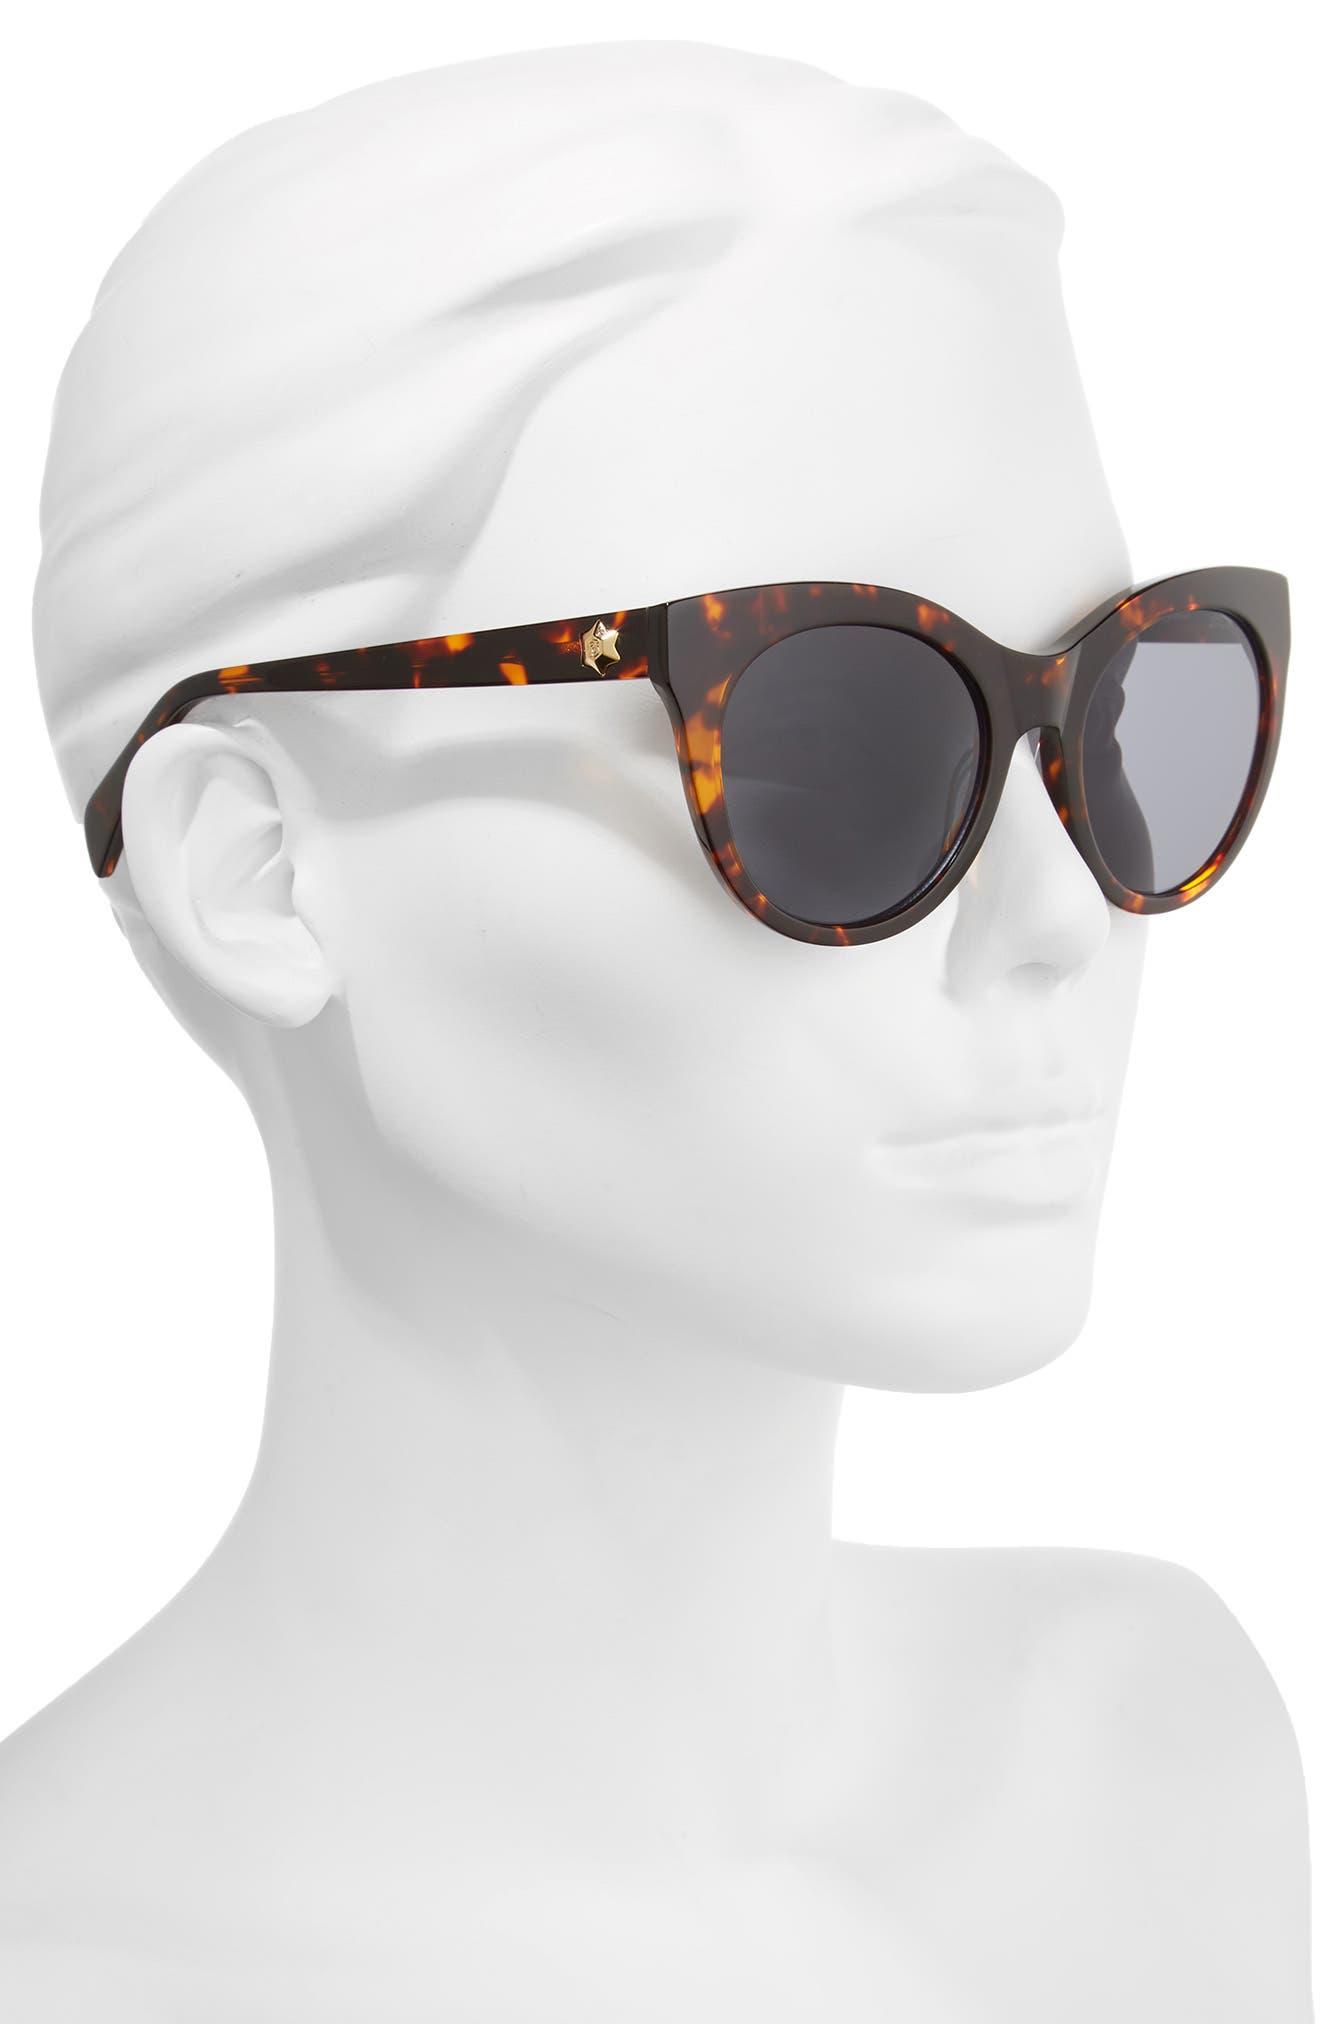 52mm Round Cat Eye Sunglasses,                             Alternate thumbnail 6, color,